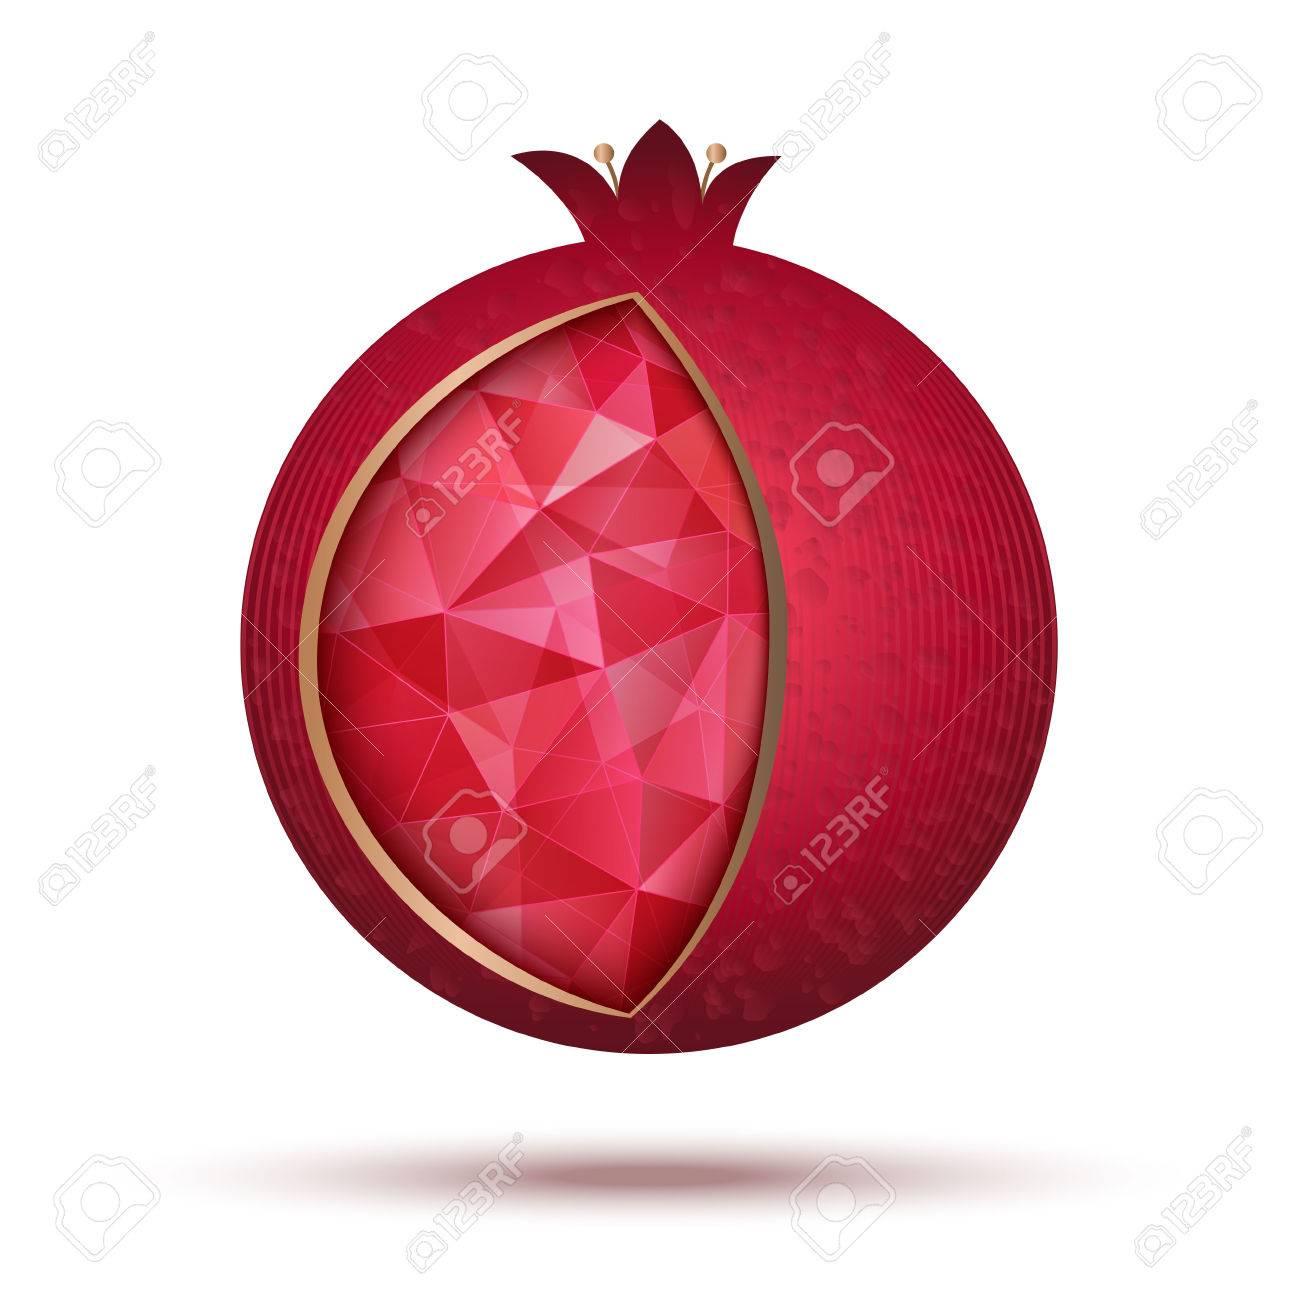 Ripe Red Pomegranate Vector Illustration Pomegranate Icon As A